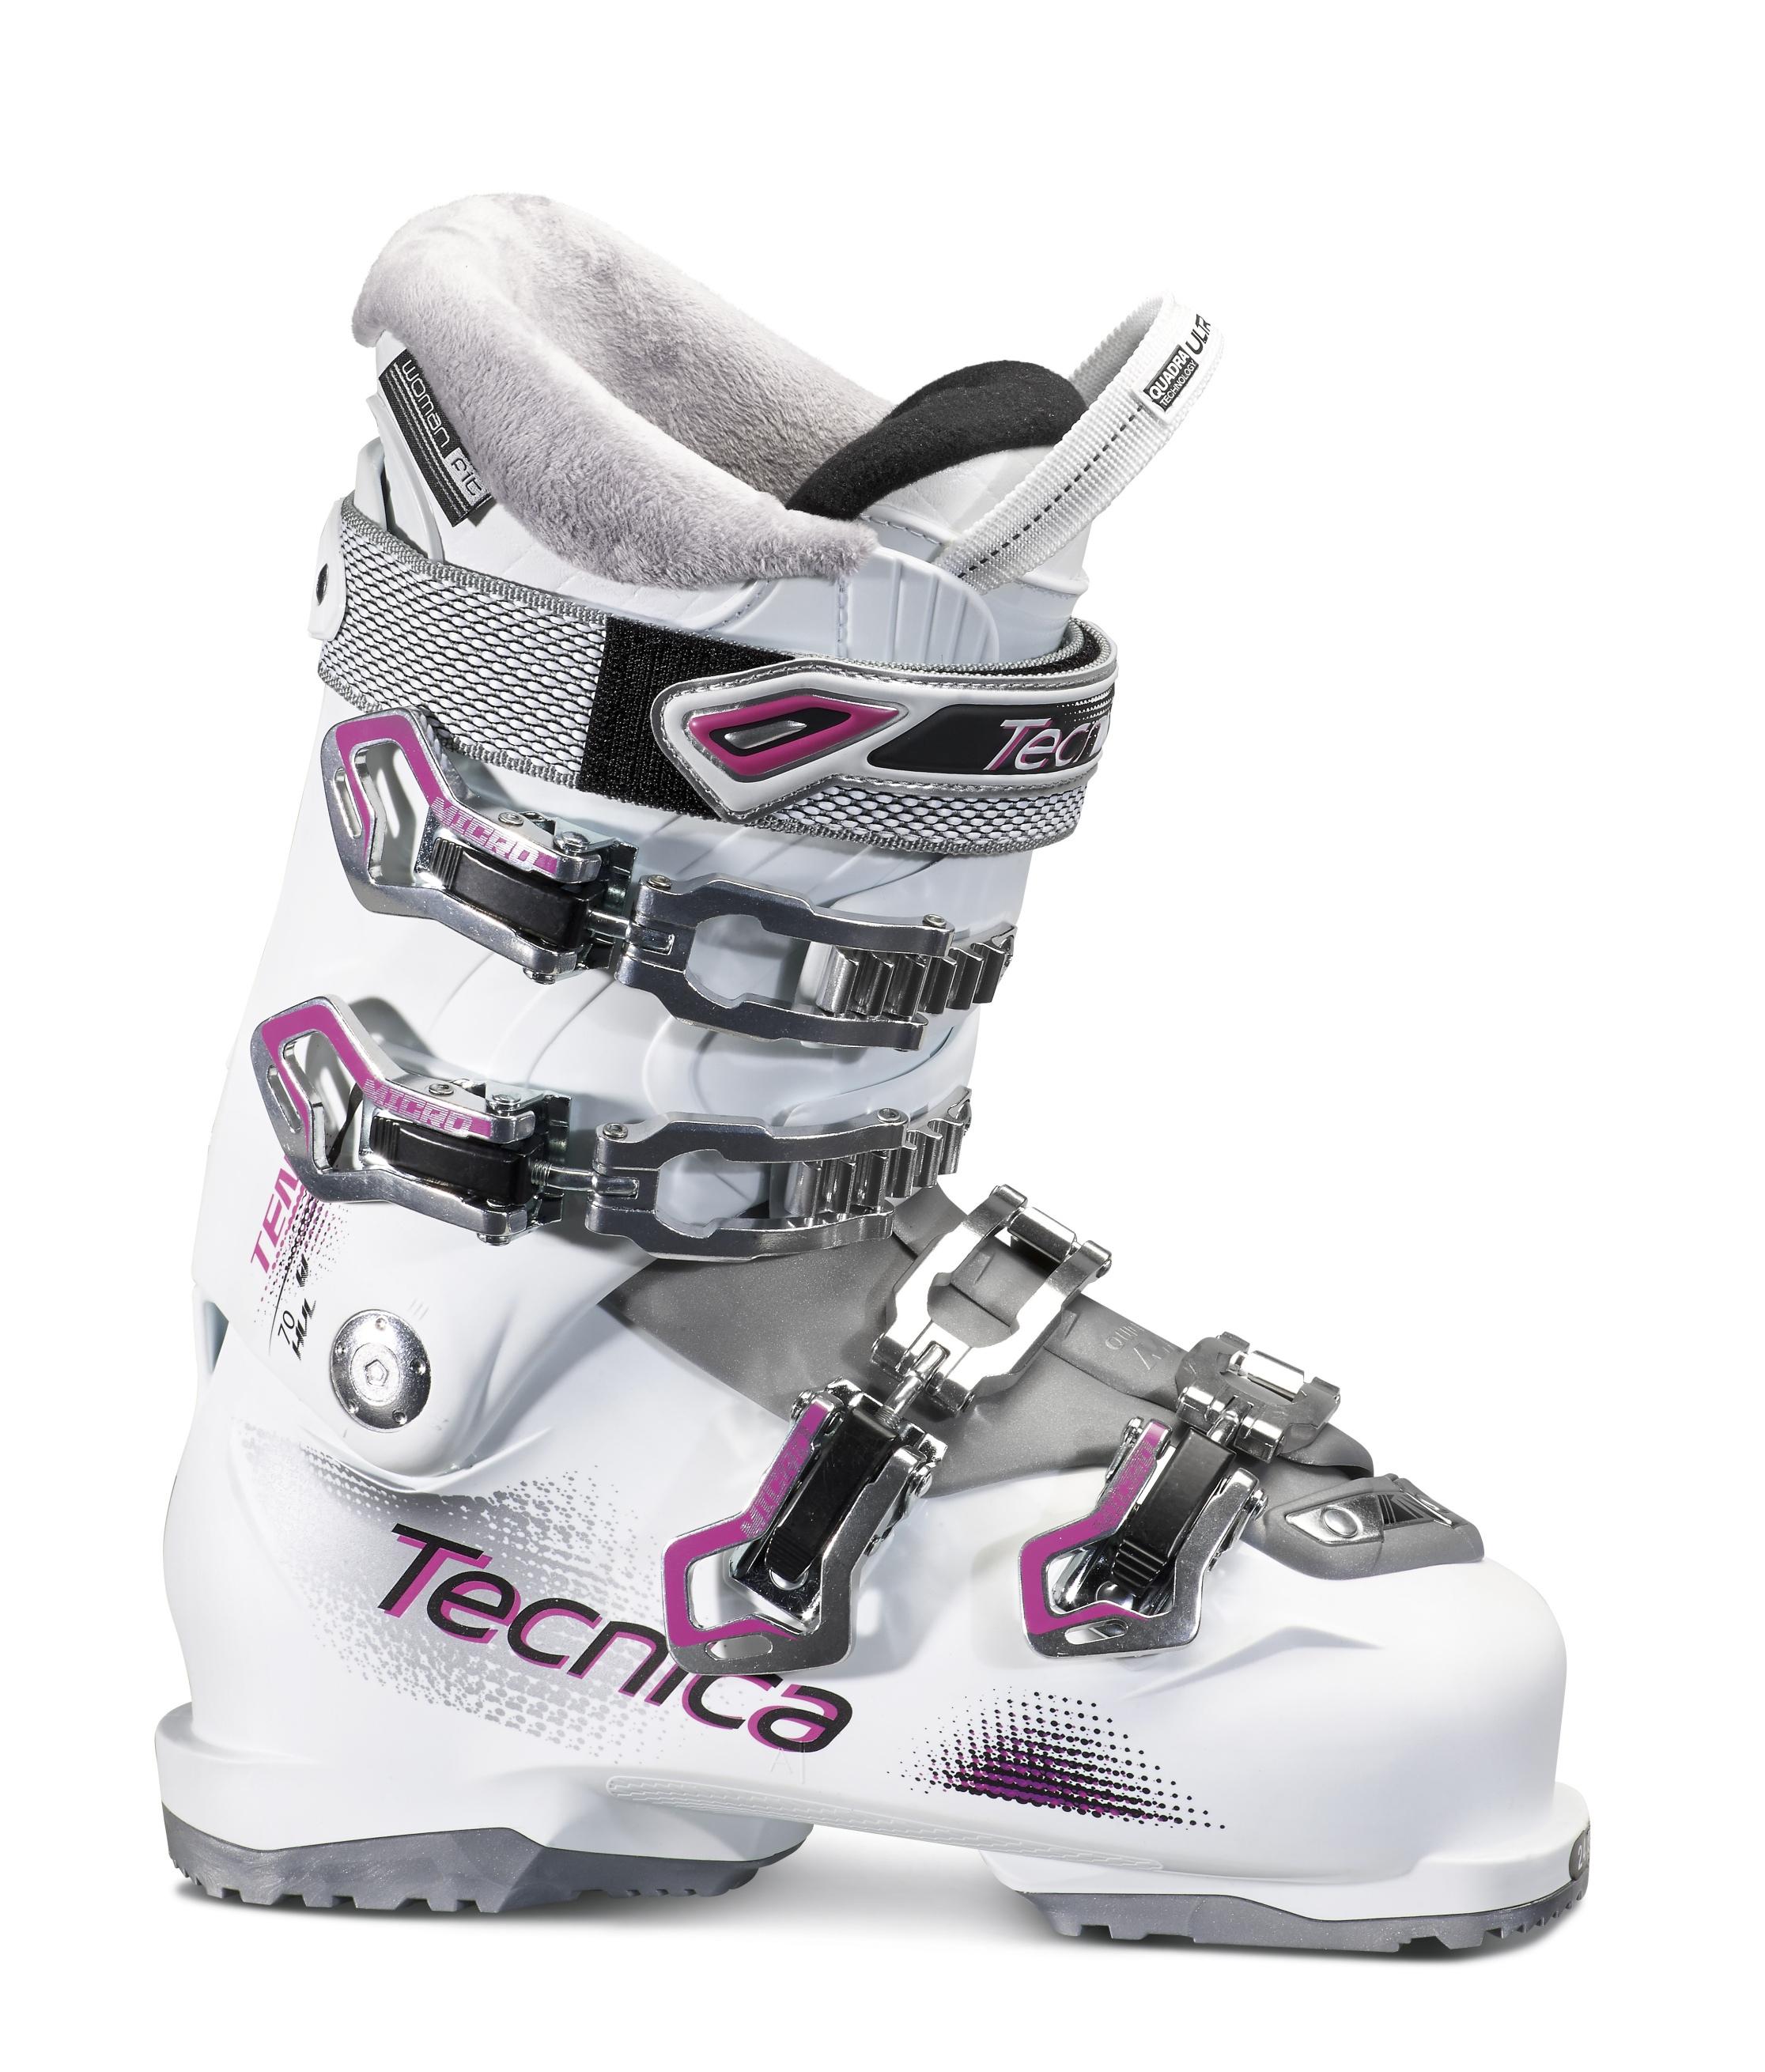 Lyžařské boty Tecnica TEN.2 70 W HVL Barva: Bílá, Velikost: 235